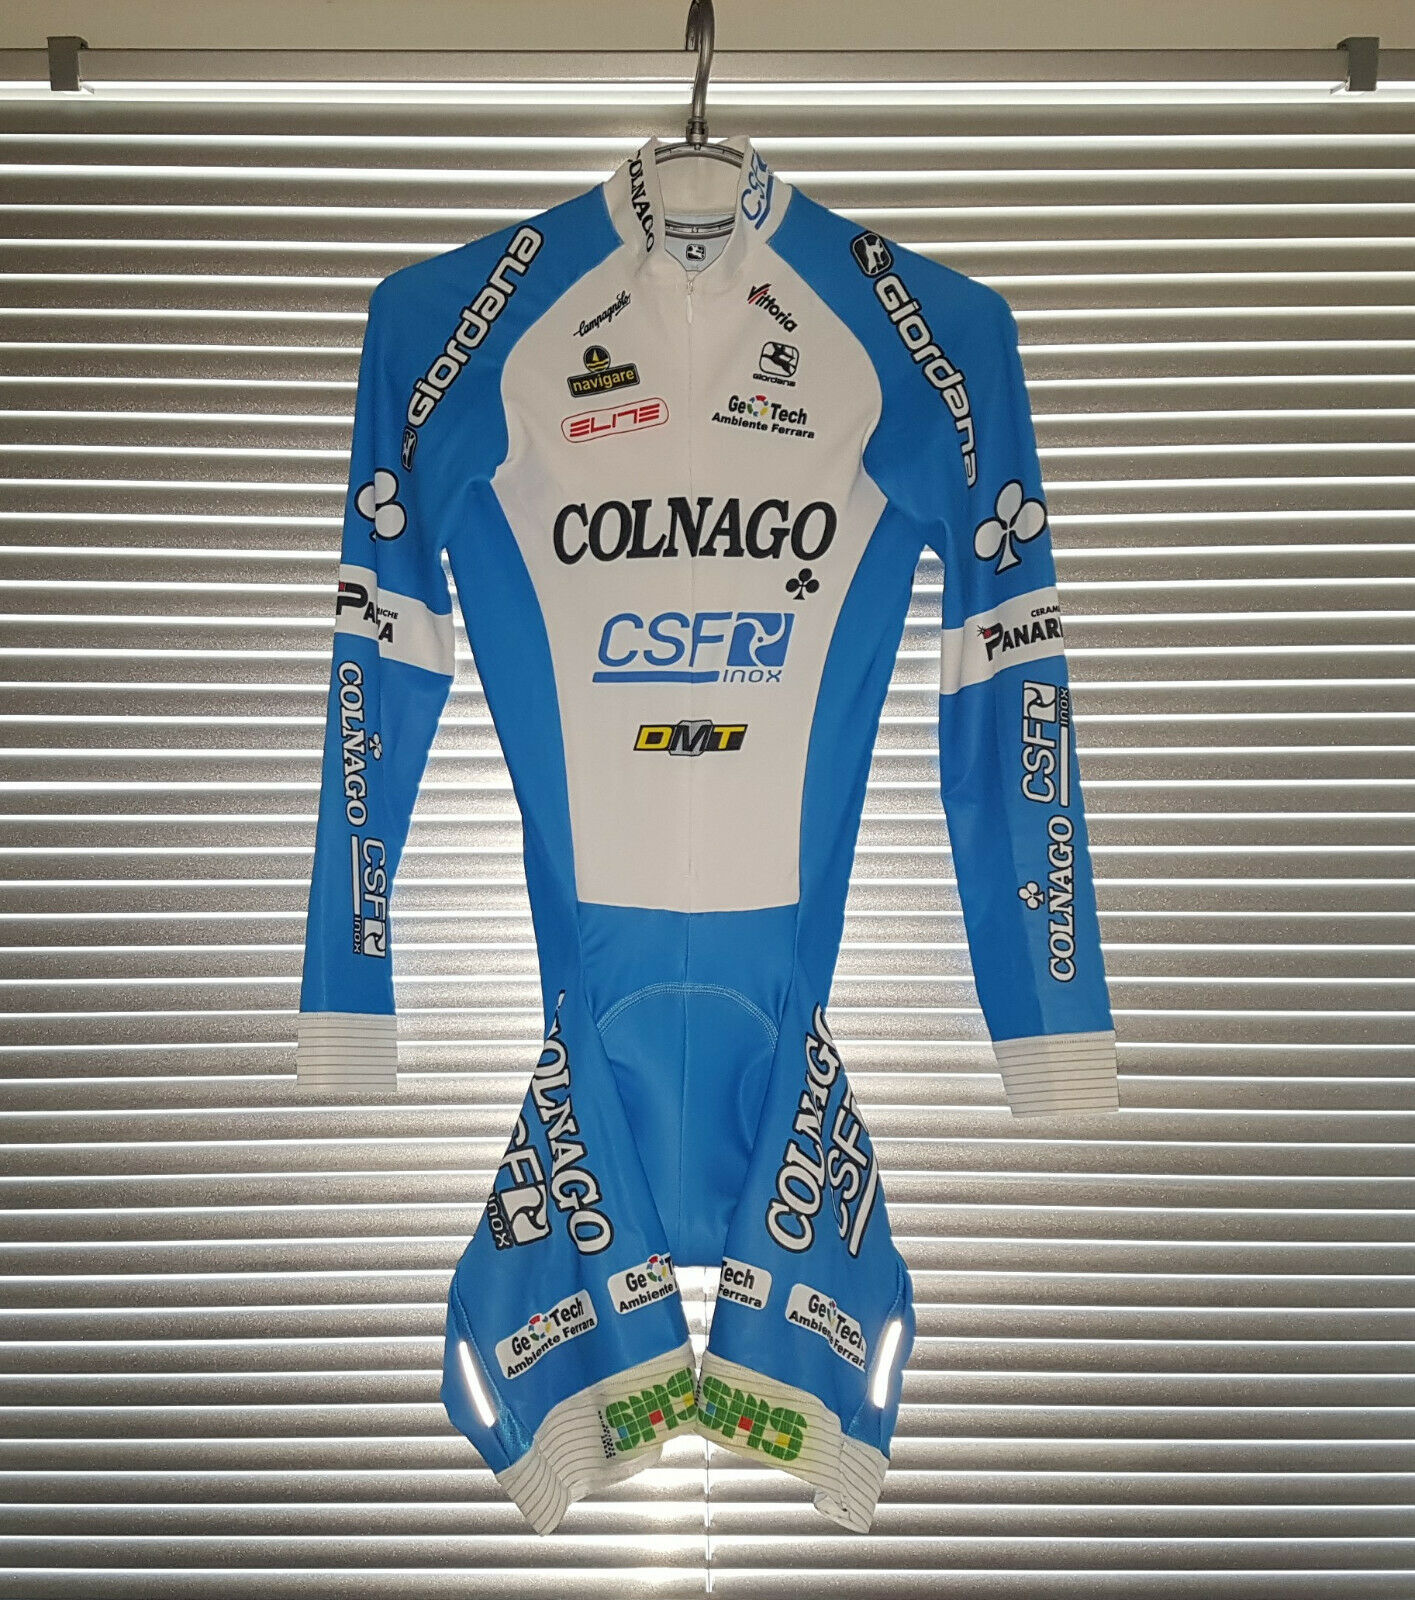 Raro Colnago CSF Panaria Issued ciclismo de velocidad Raza traje Giordana Hombre Talla M